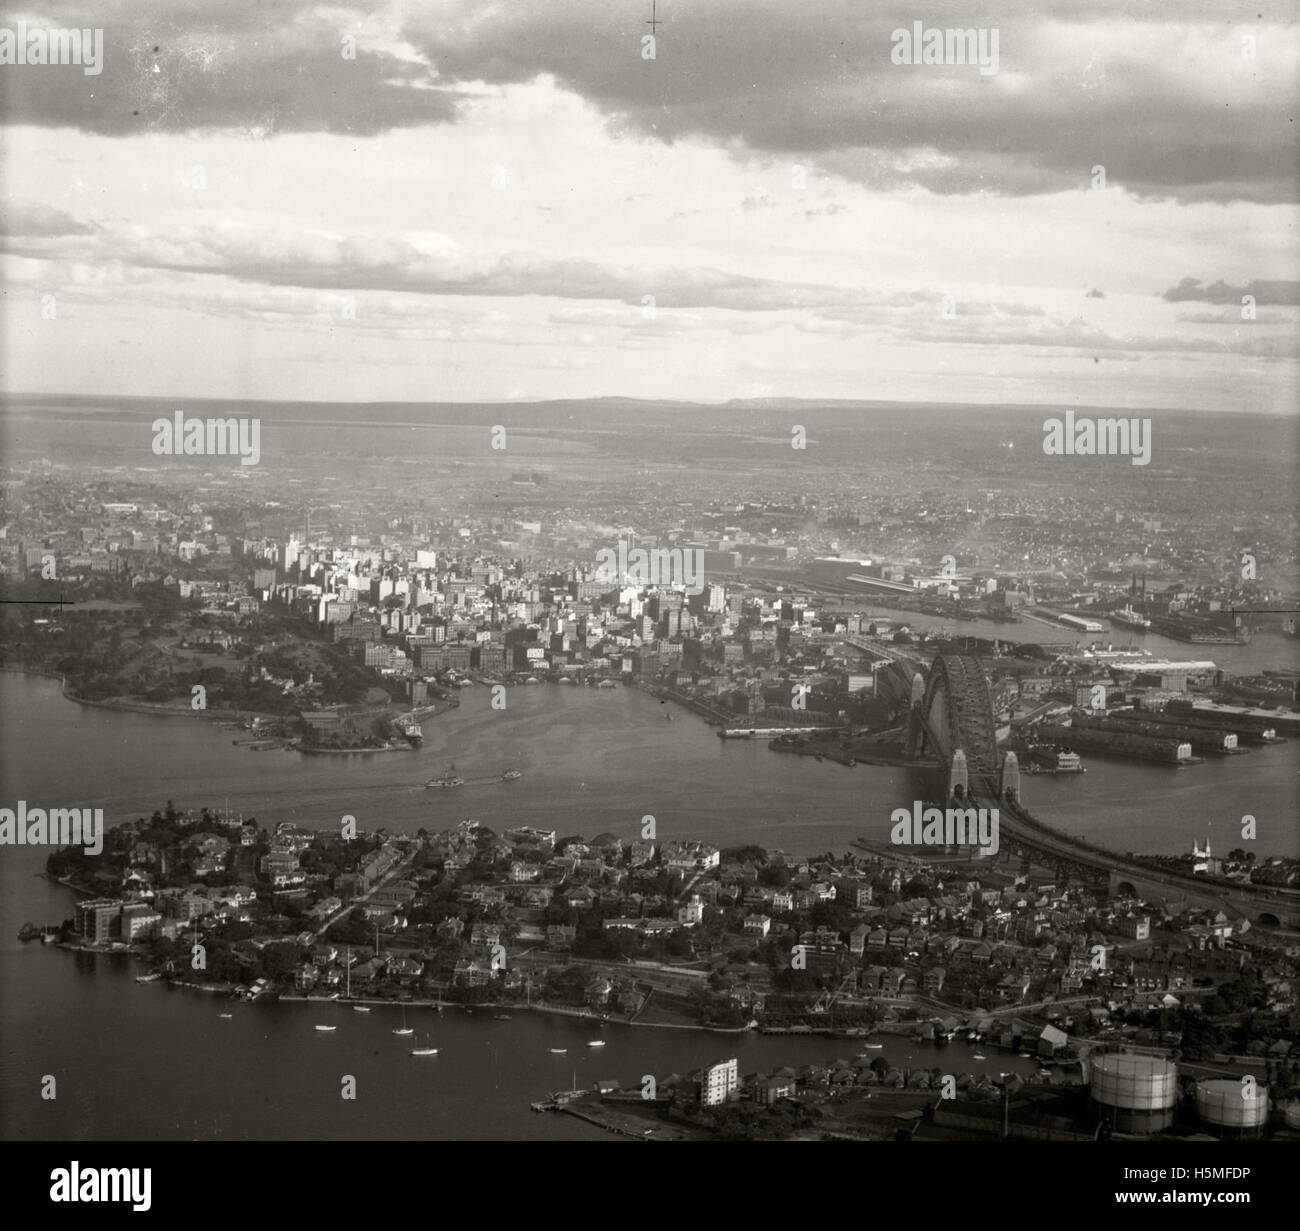 Kirribilli, Harbour Bridge & City - 15 June 1937 - Stock Image